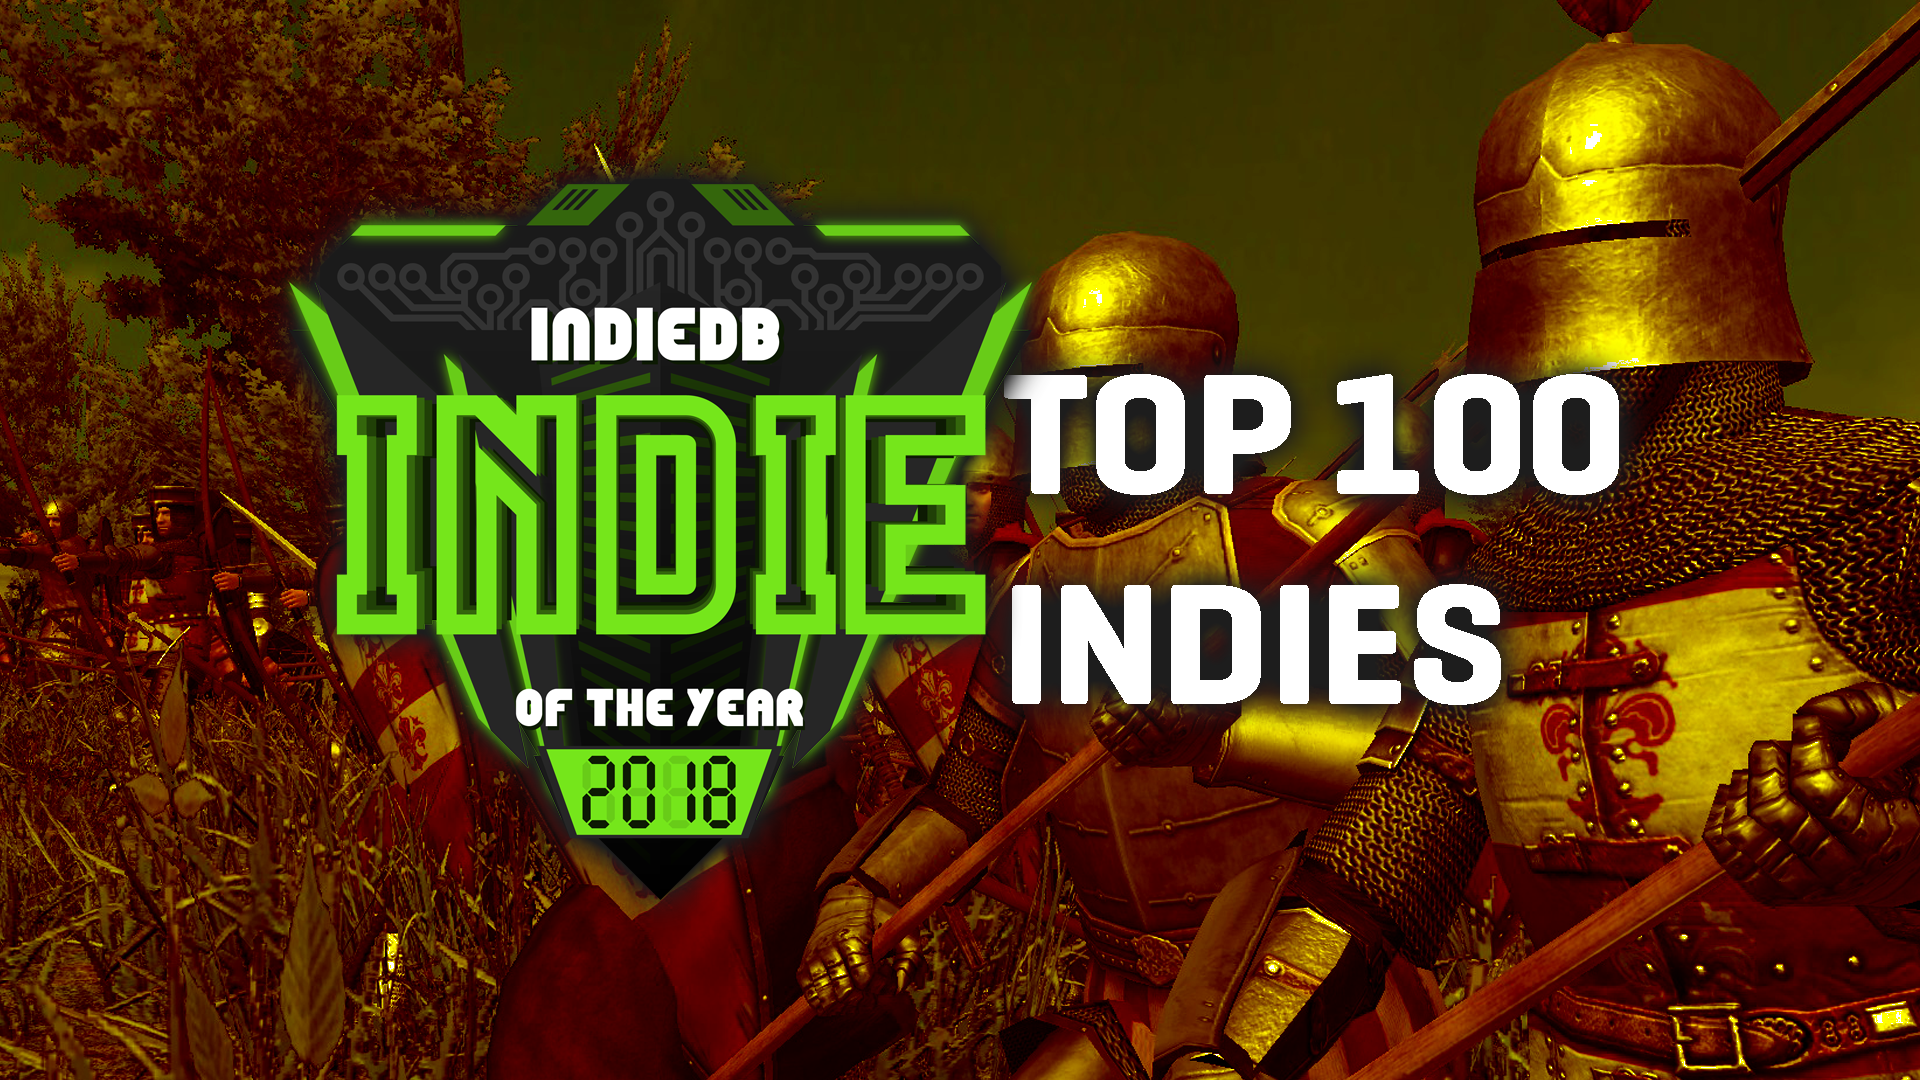 eoy18 indiedb top 100